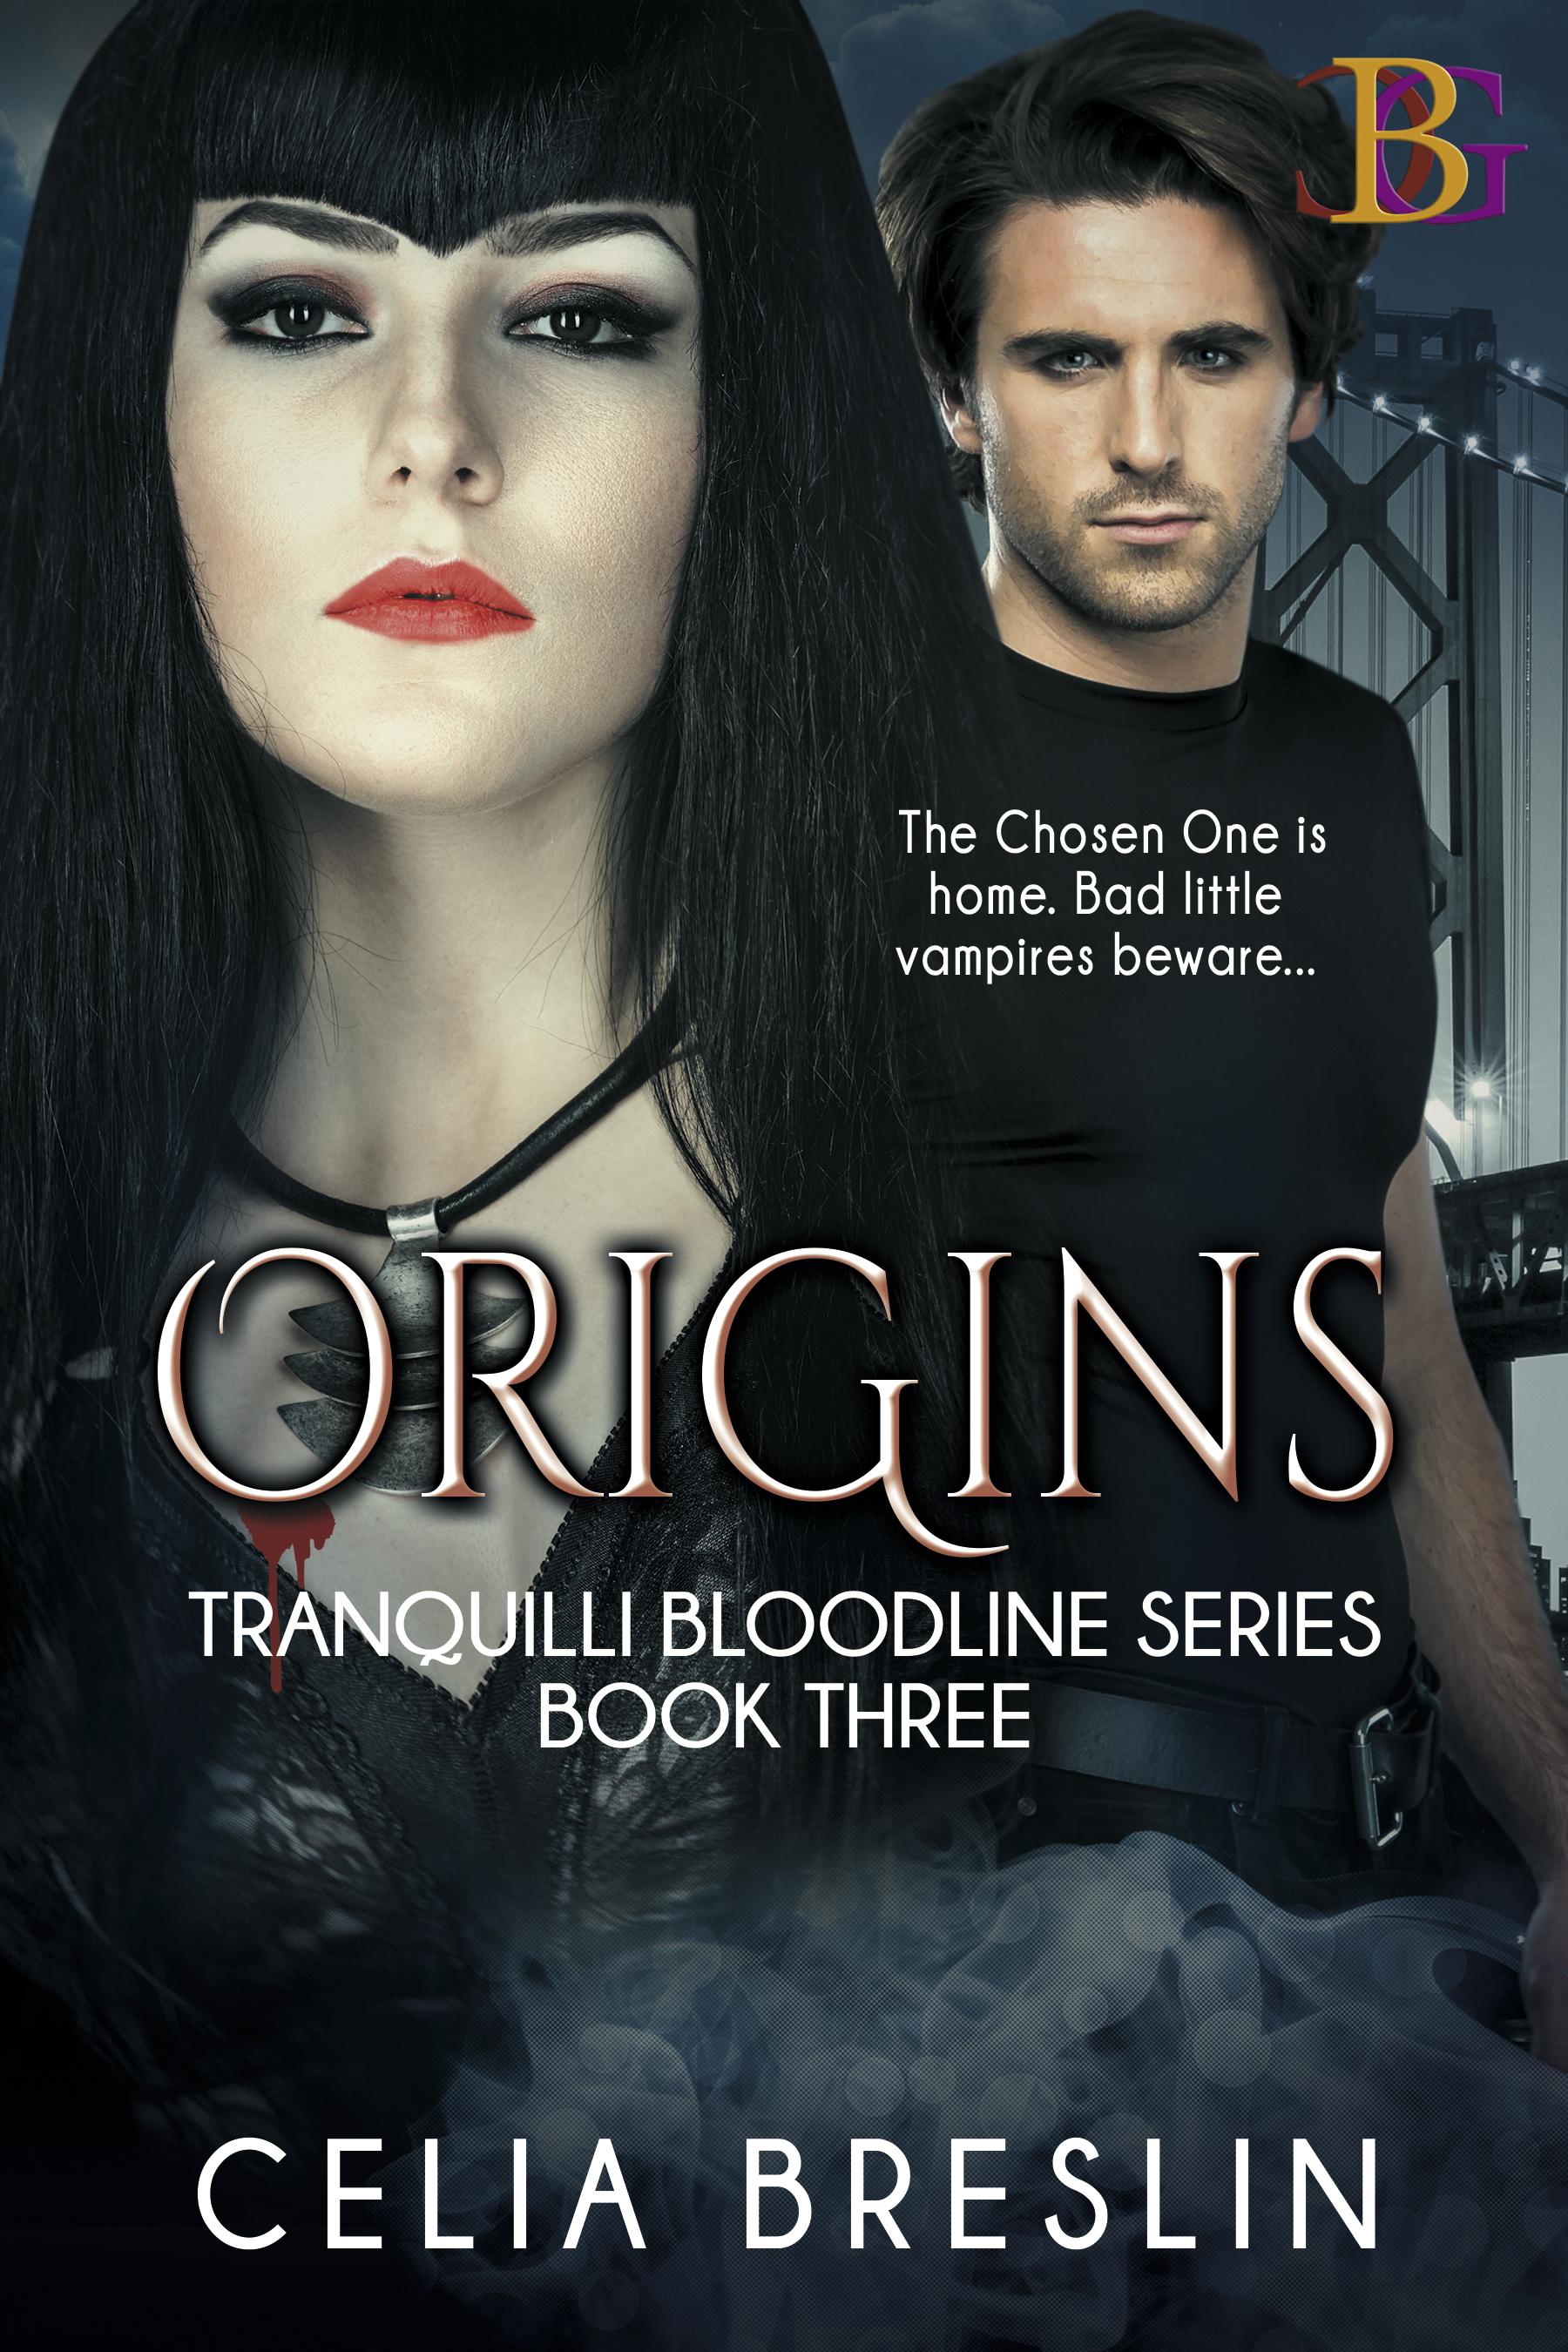 Origins by Celia Breslin new book cover